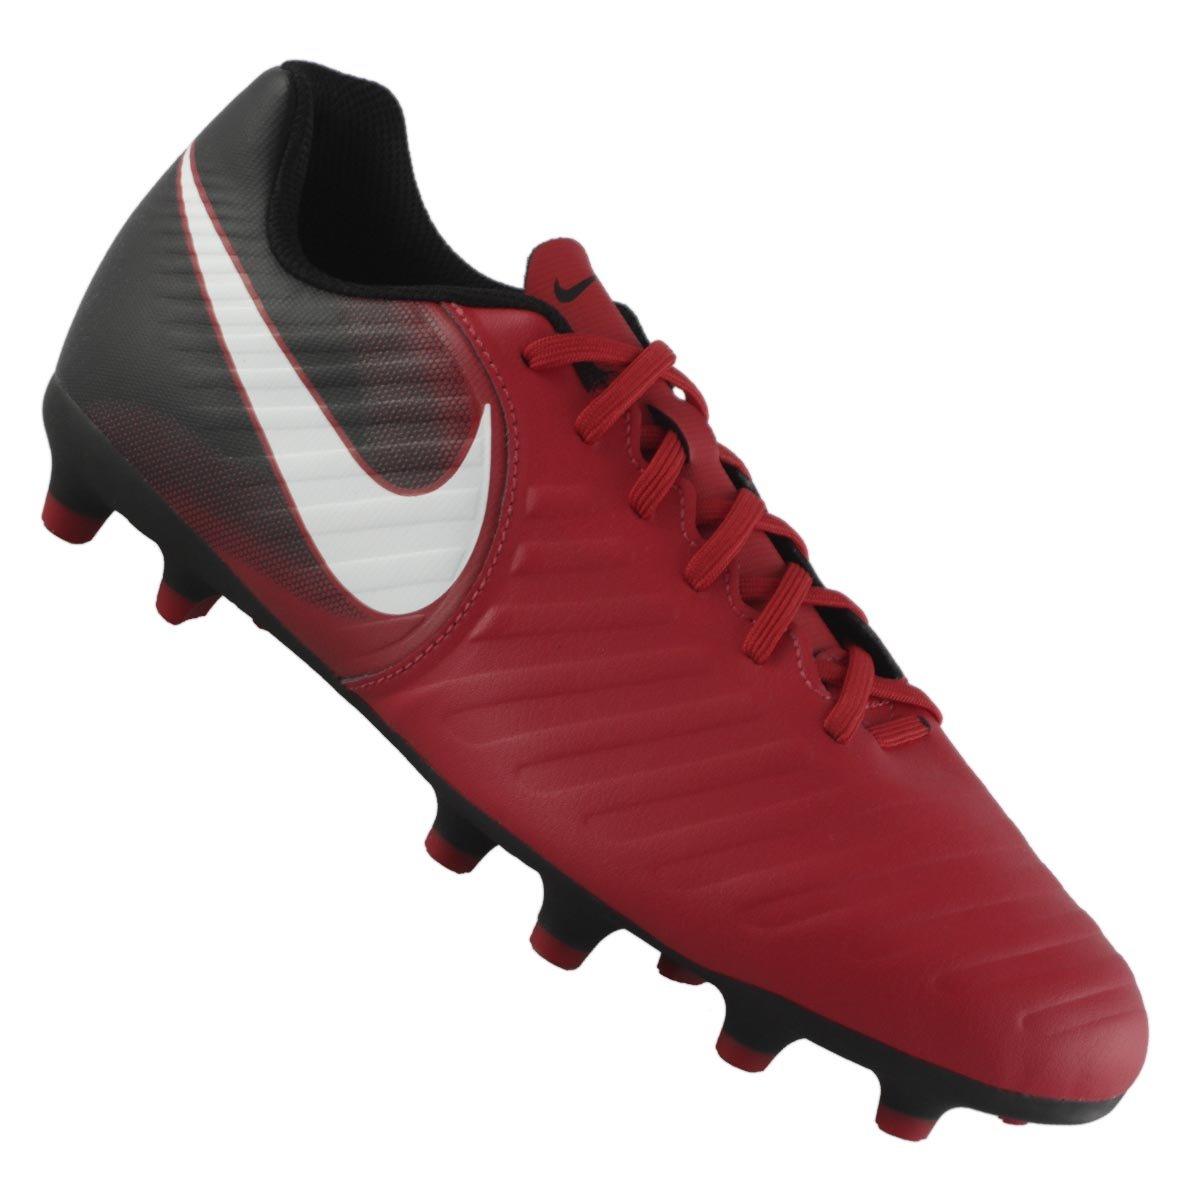 Chuteira Nike Tiempo Rio IV FG  f346aa4f7ac45